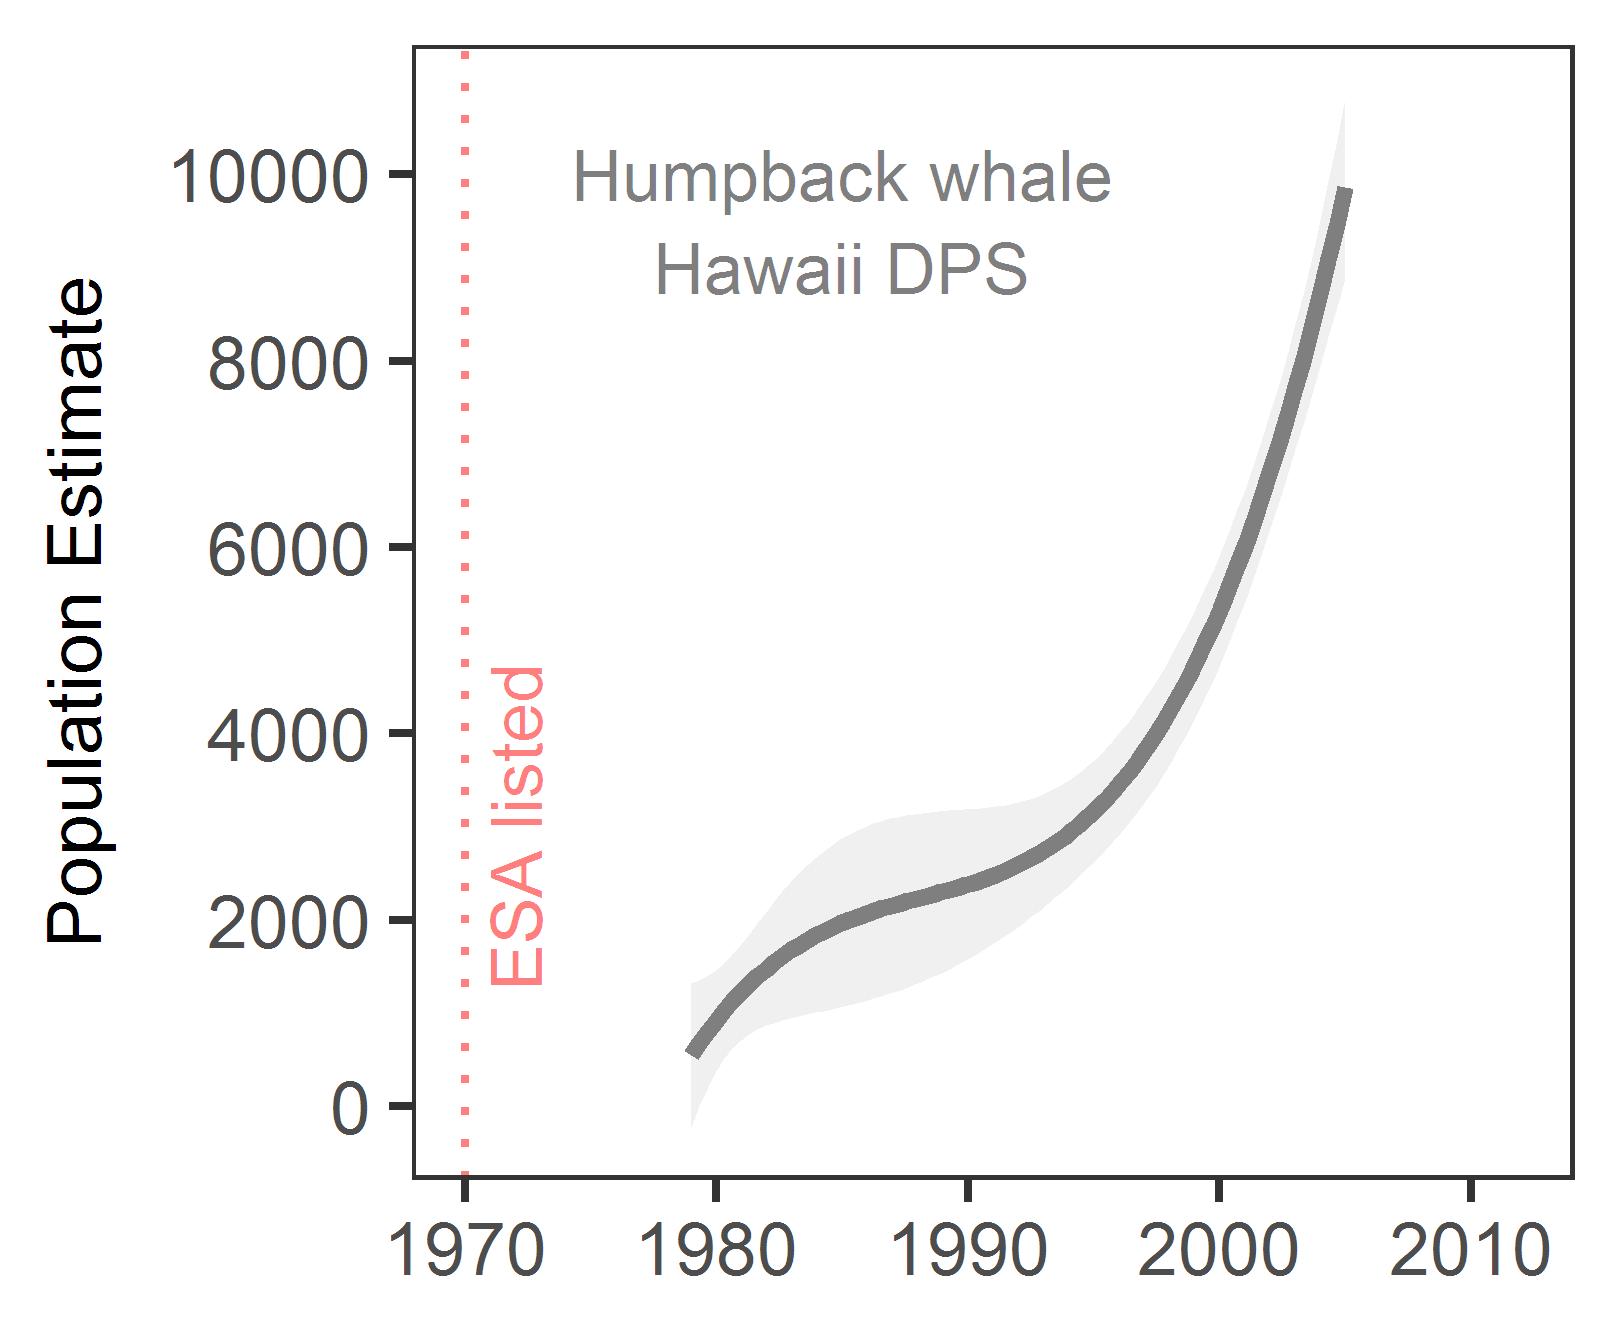 Humpback-Hawaii-DPS-Abel-Valdivia-Center-for-Biological-Diversity-FPWC-1550606834280-1550606836641.PNG